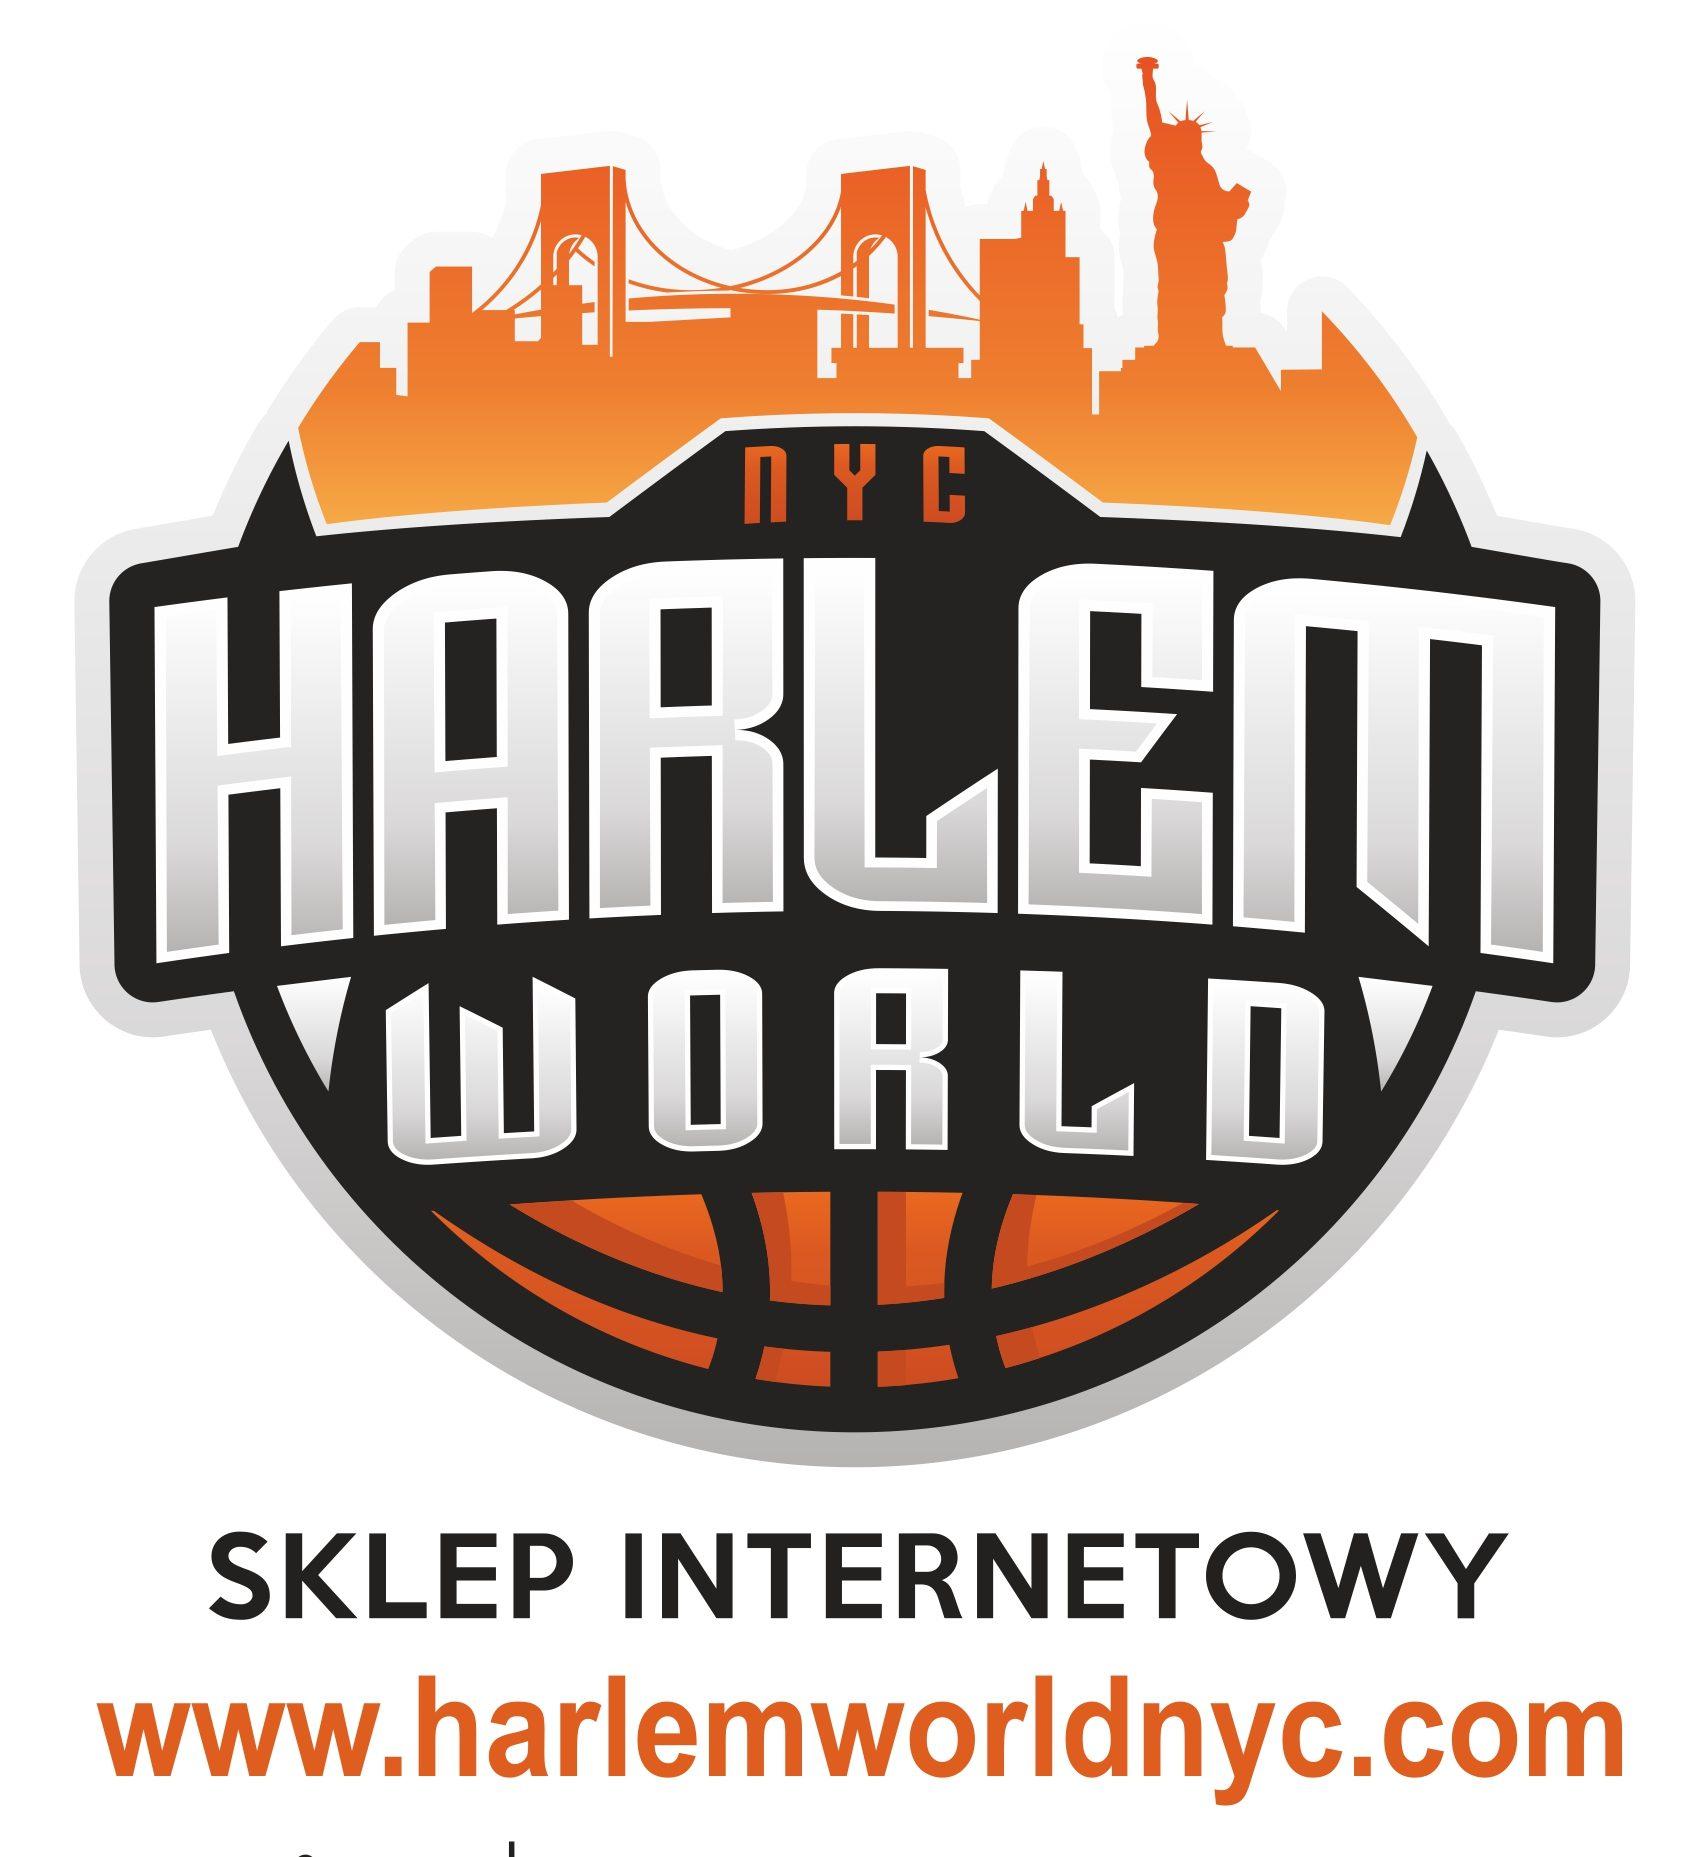 Harlem World NYC